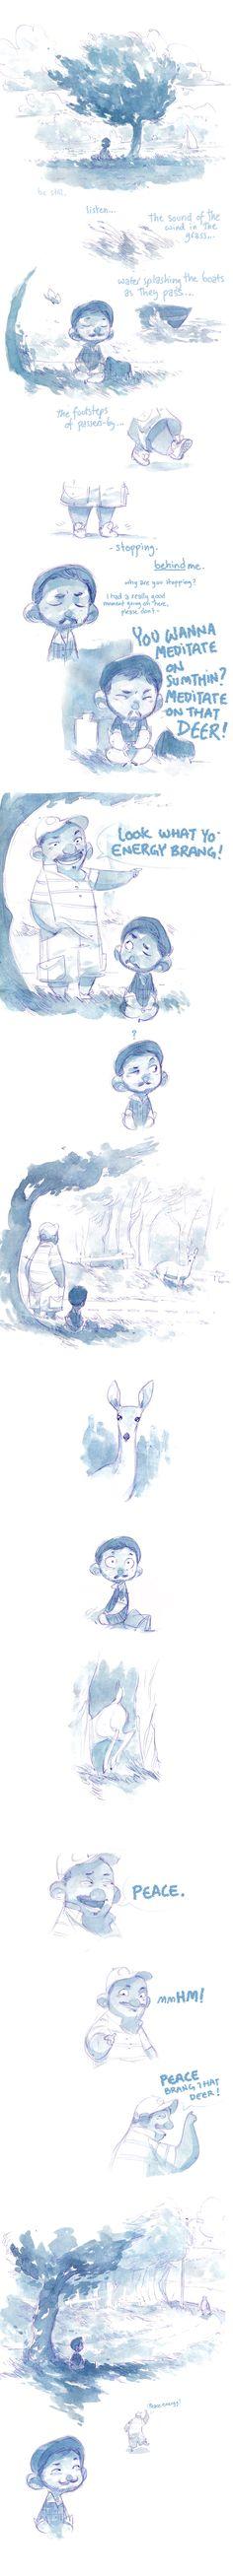 "Watercolor Comic - Peace Energy by nicholaskole.deviantart.com ""Peace Energy!"""